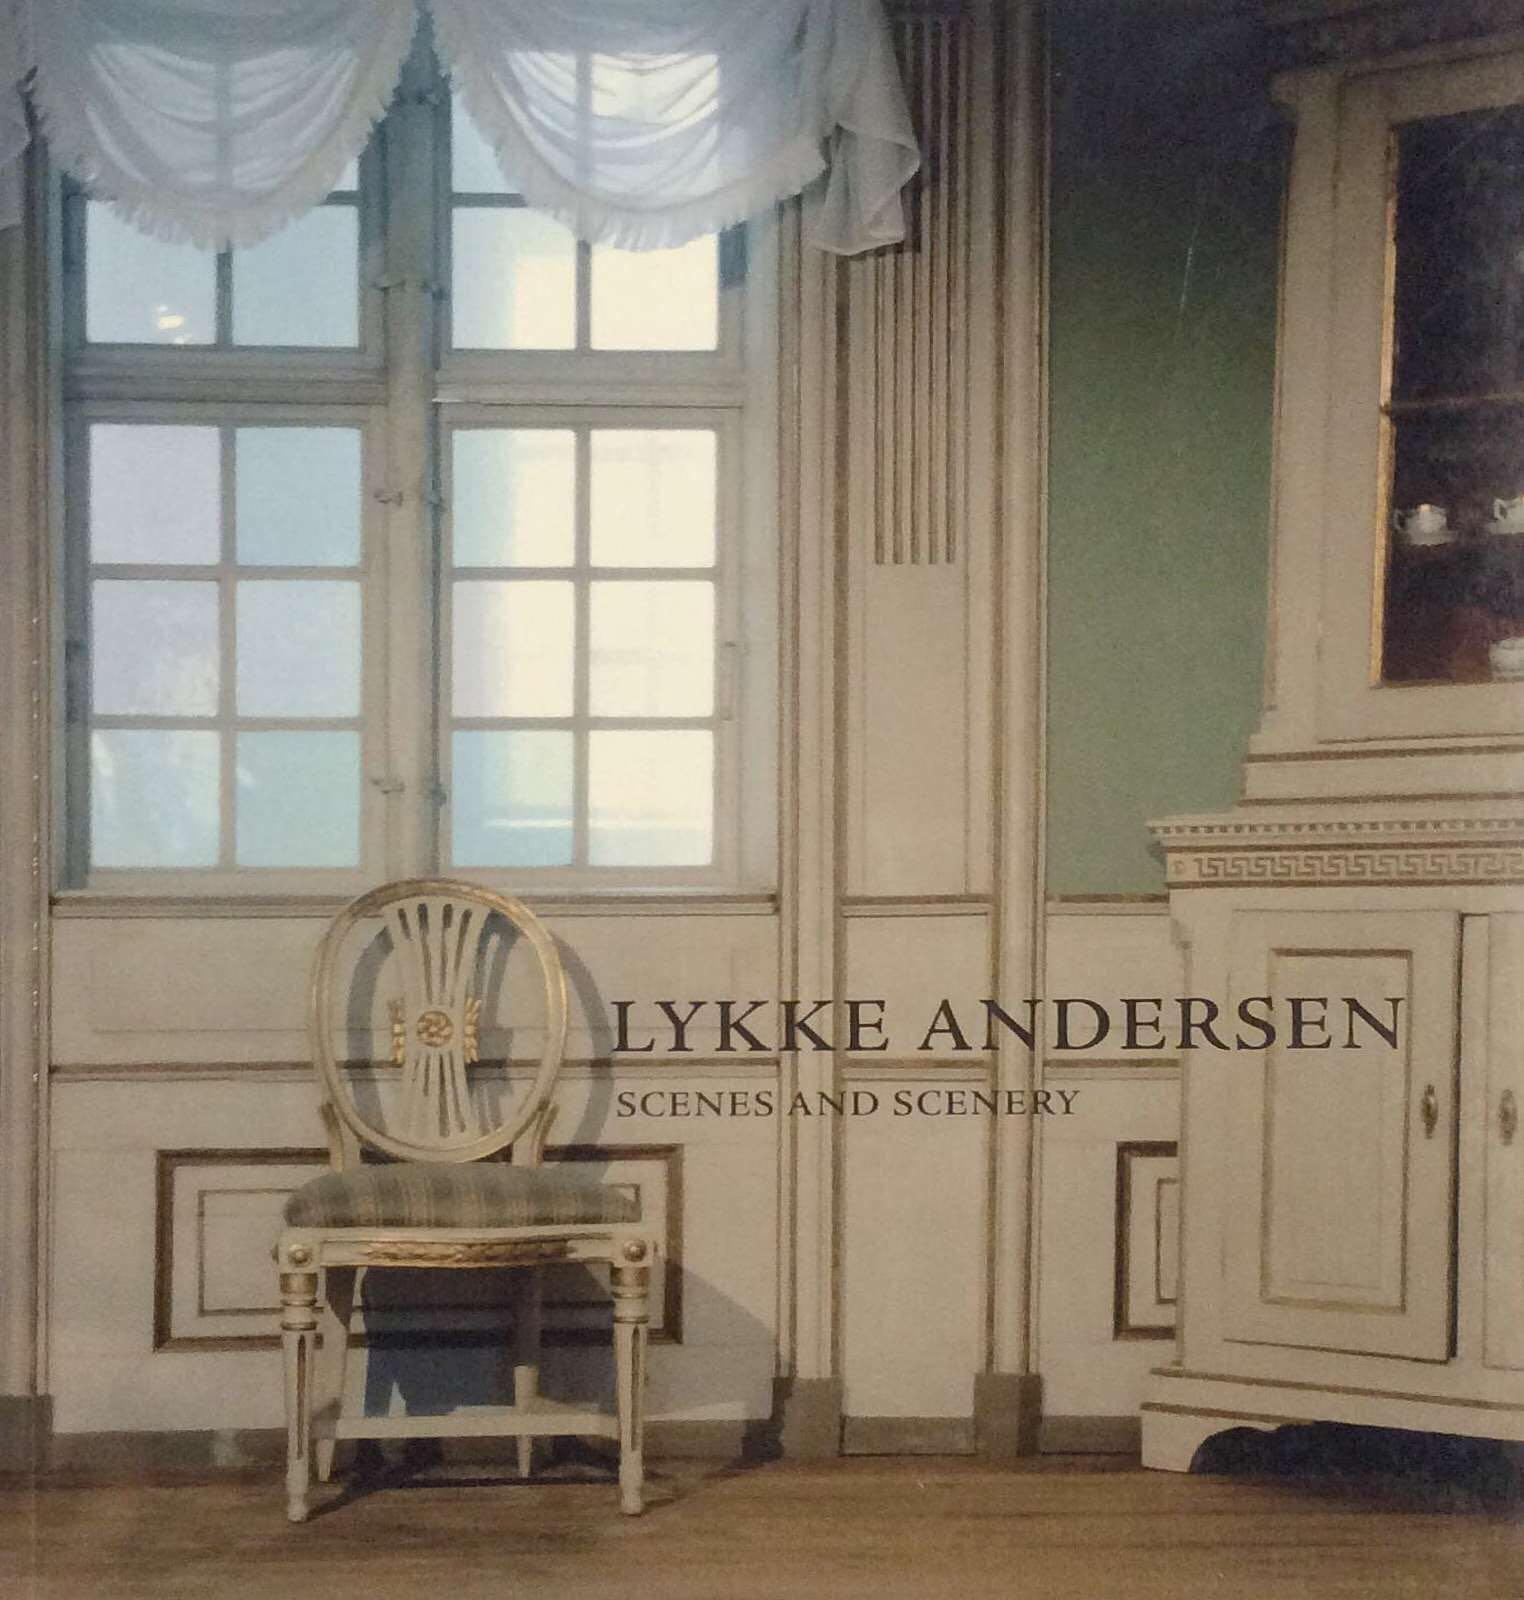 Andersen, Lykke. Scenes and scenery